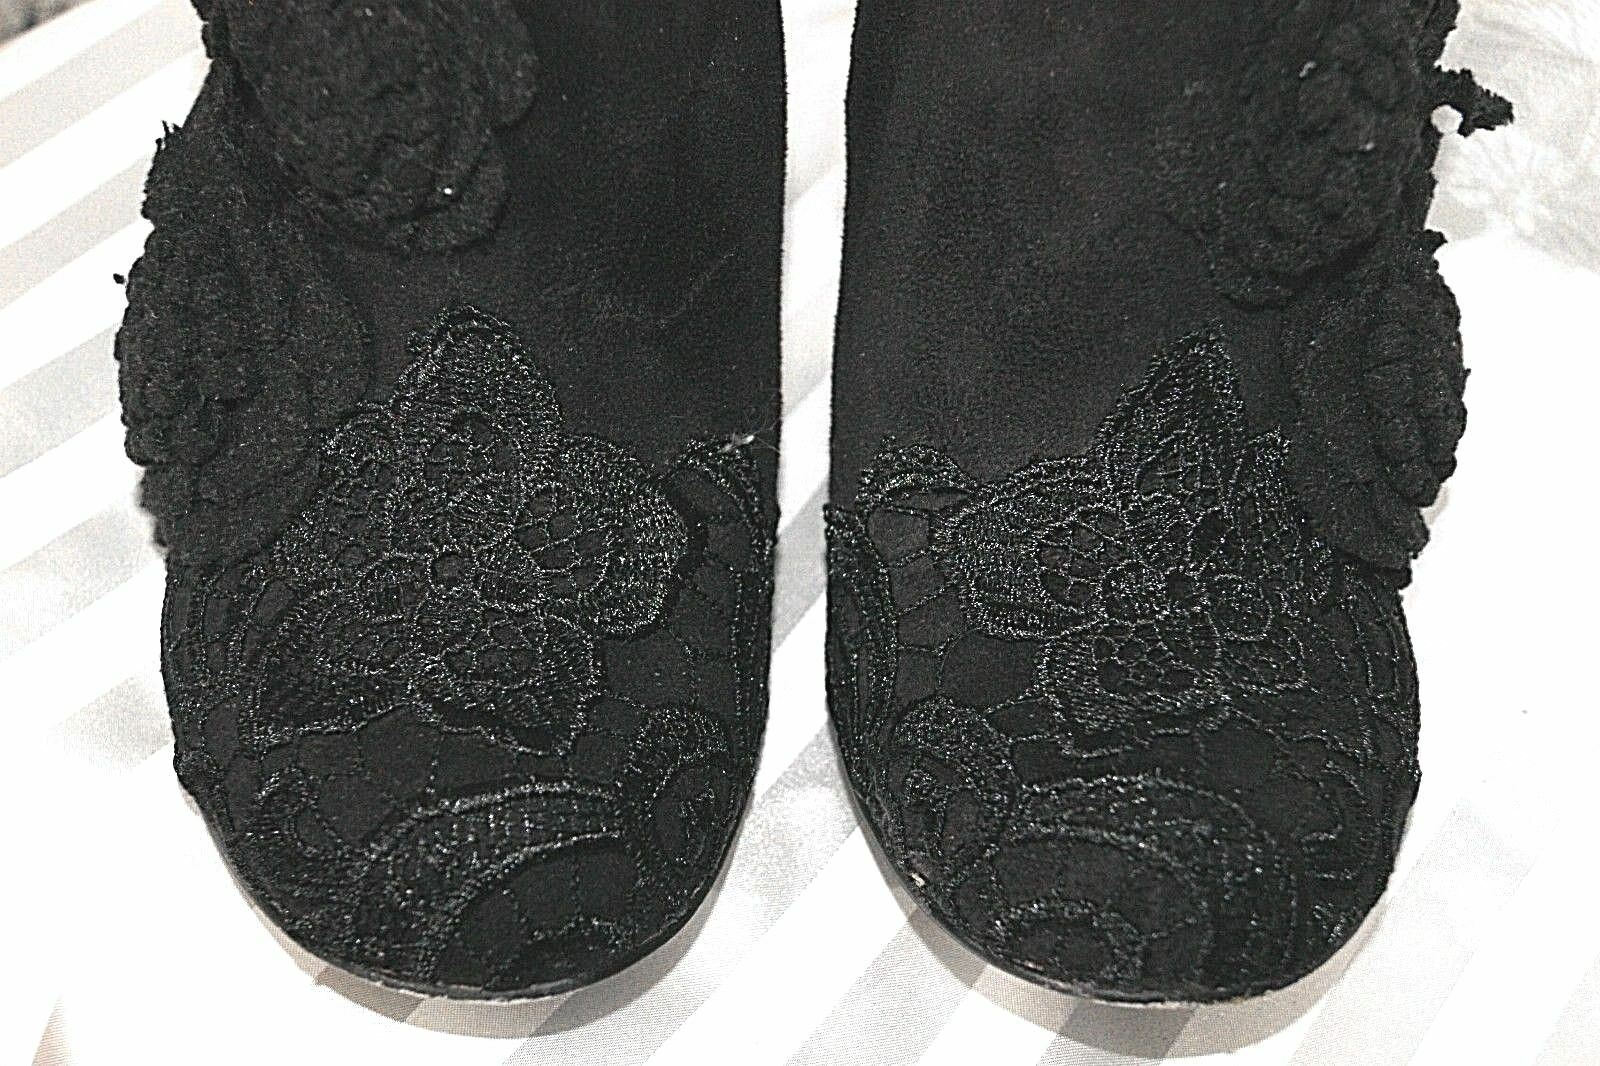 Muting by Irregular Choise Choise Irregular Tronchetti-boots 40 NERO FIORI + punta Asylum 027c2b